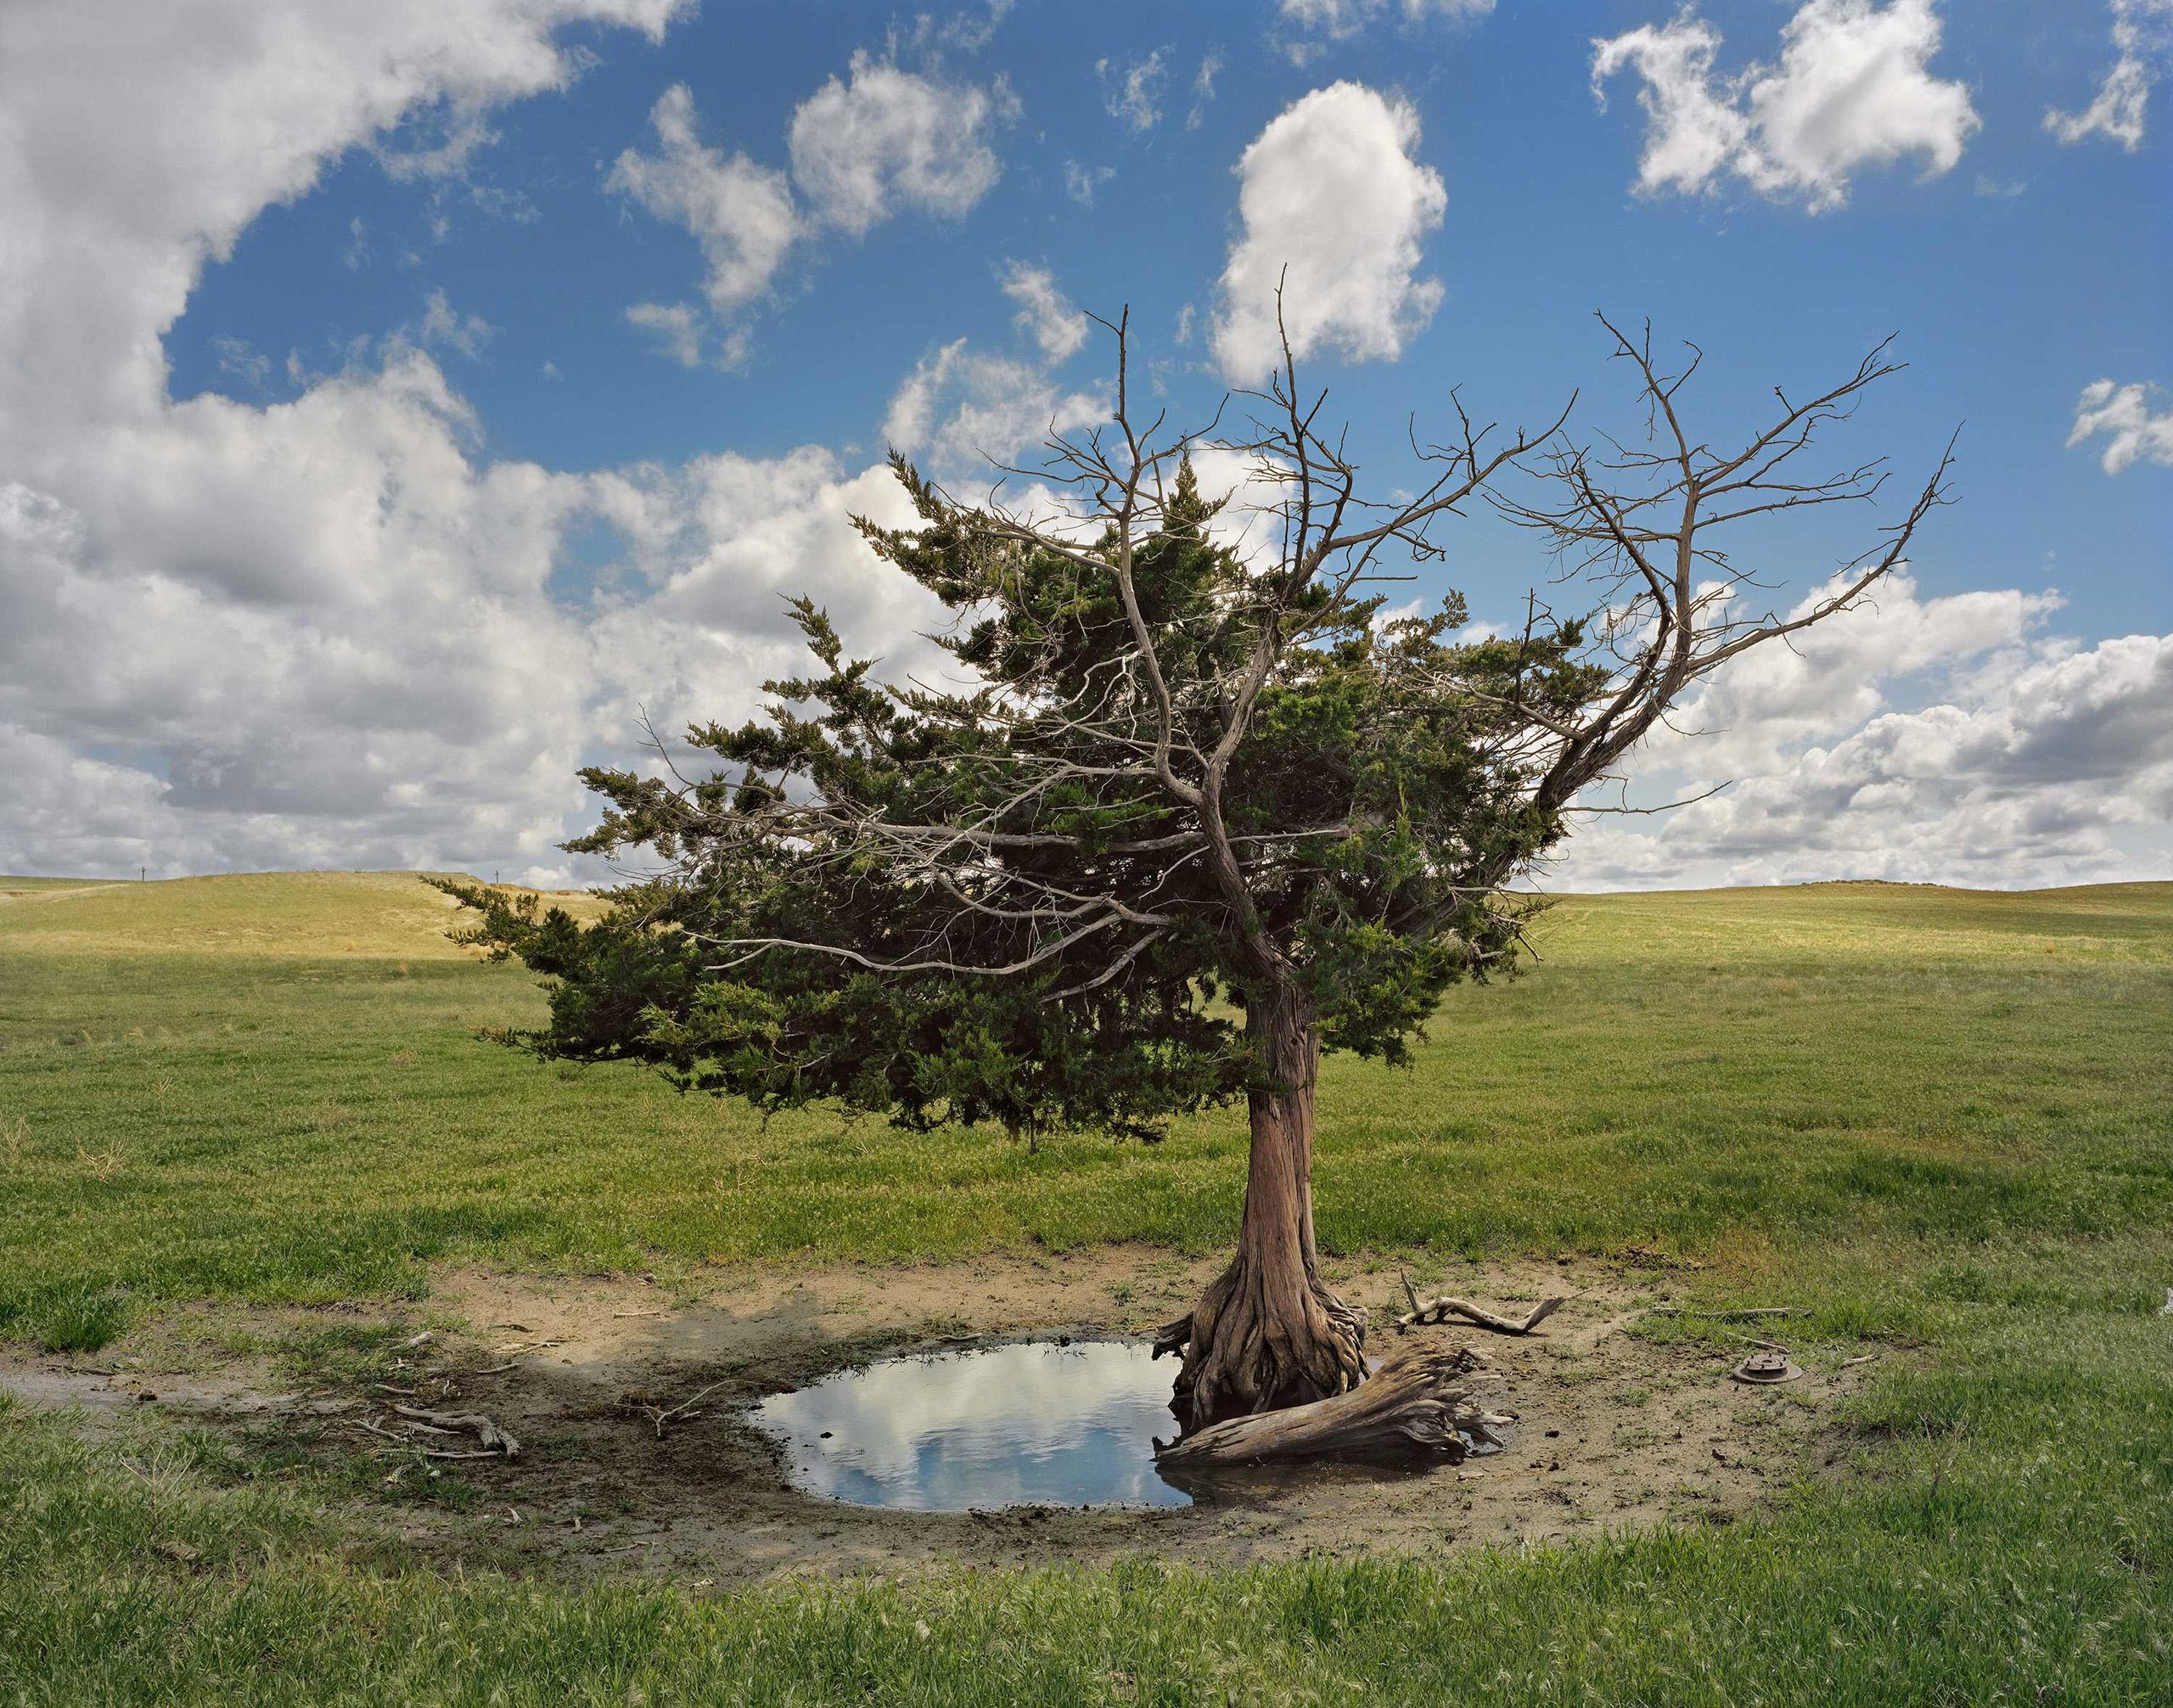 Homesteaders' Tree. Cherry County, Nebraska, 2011.